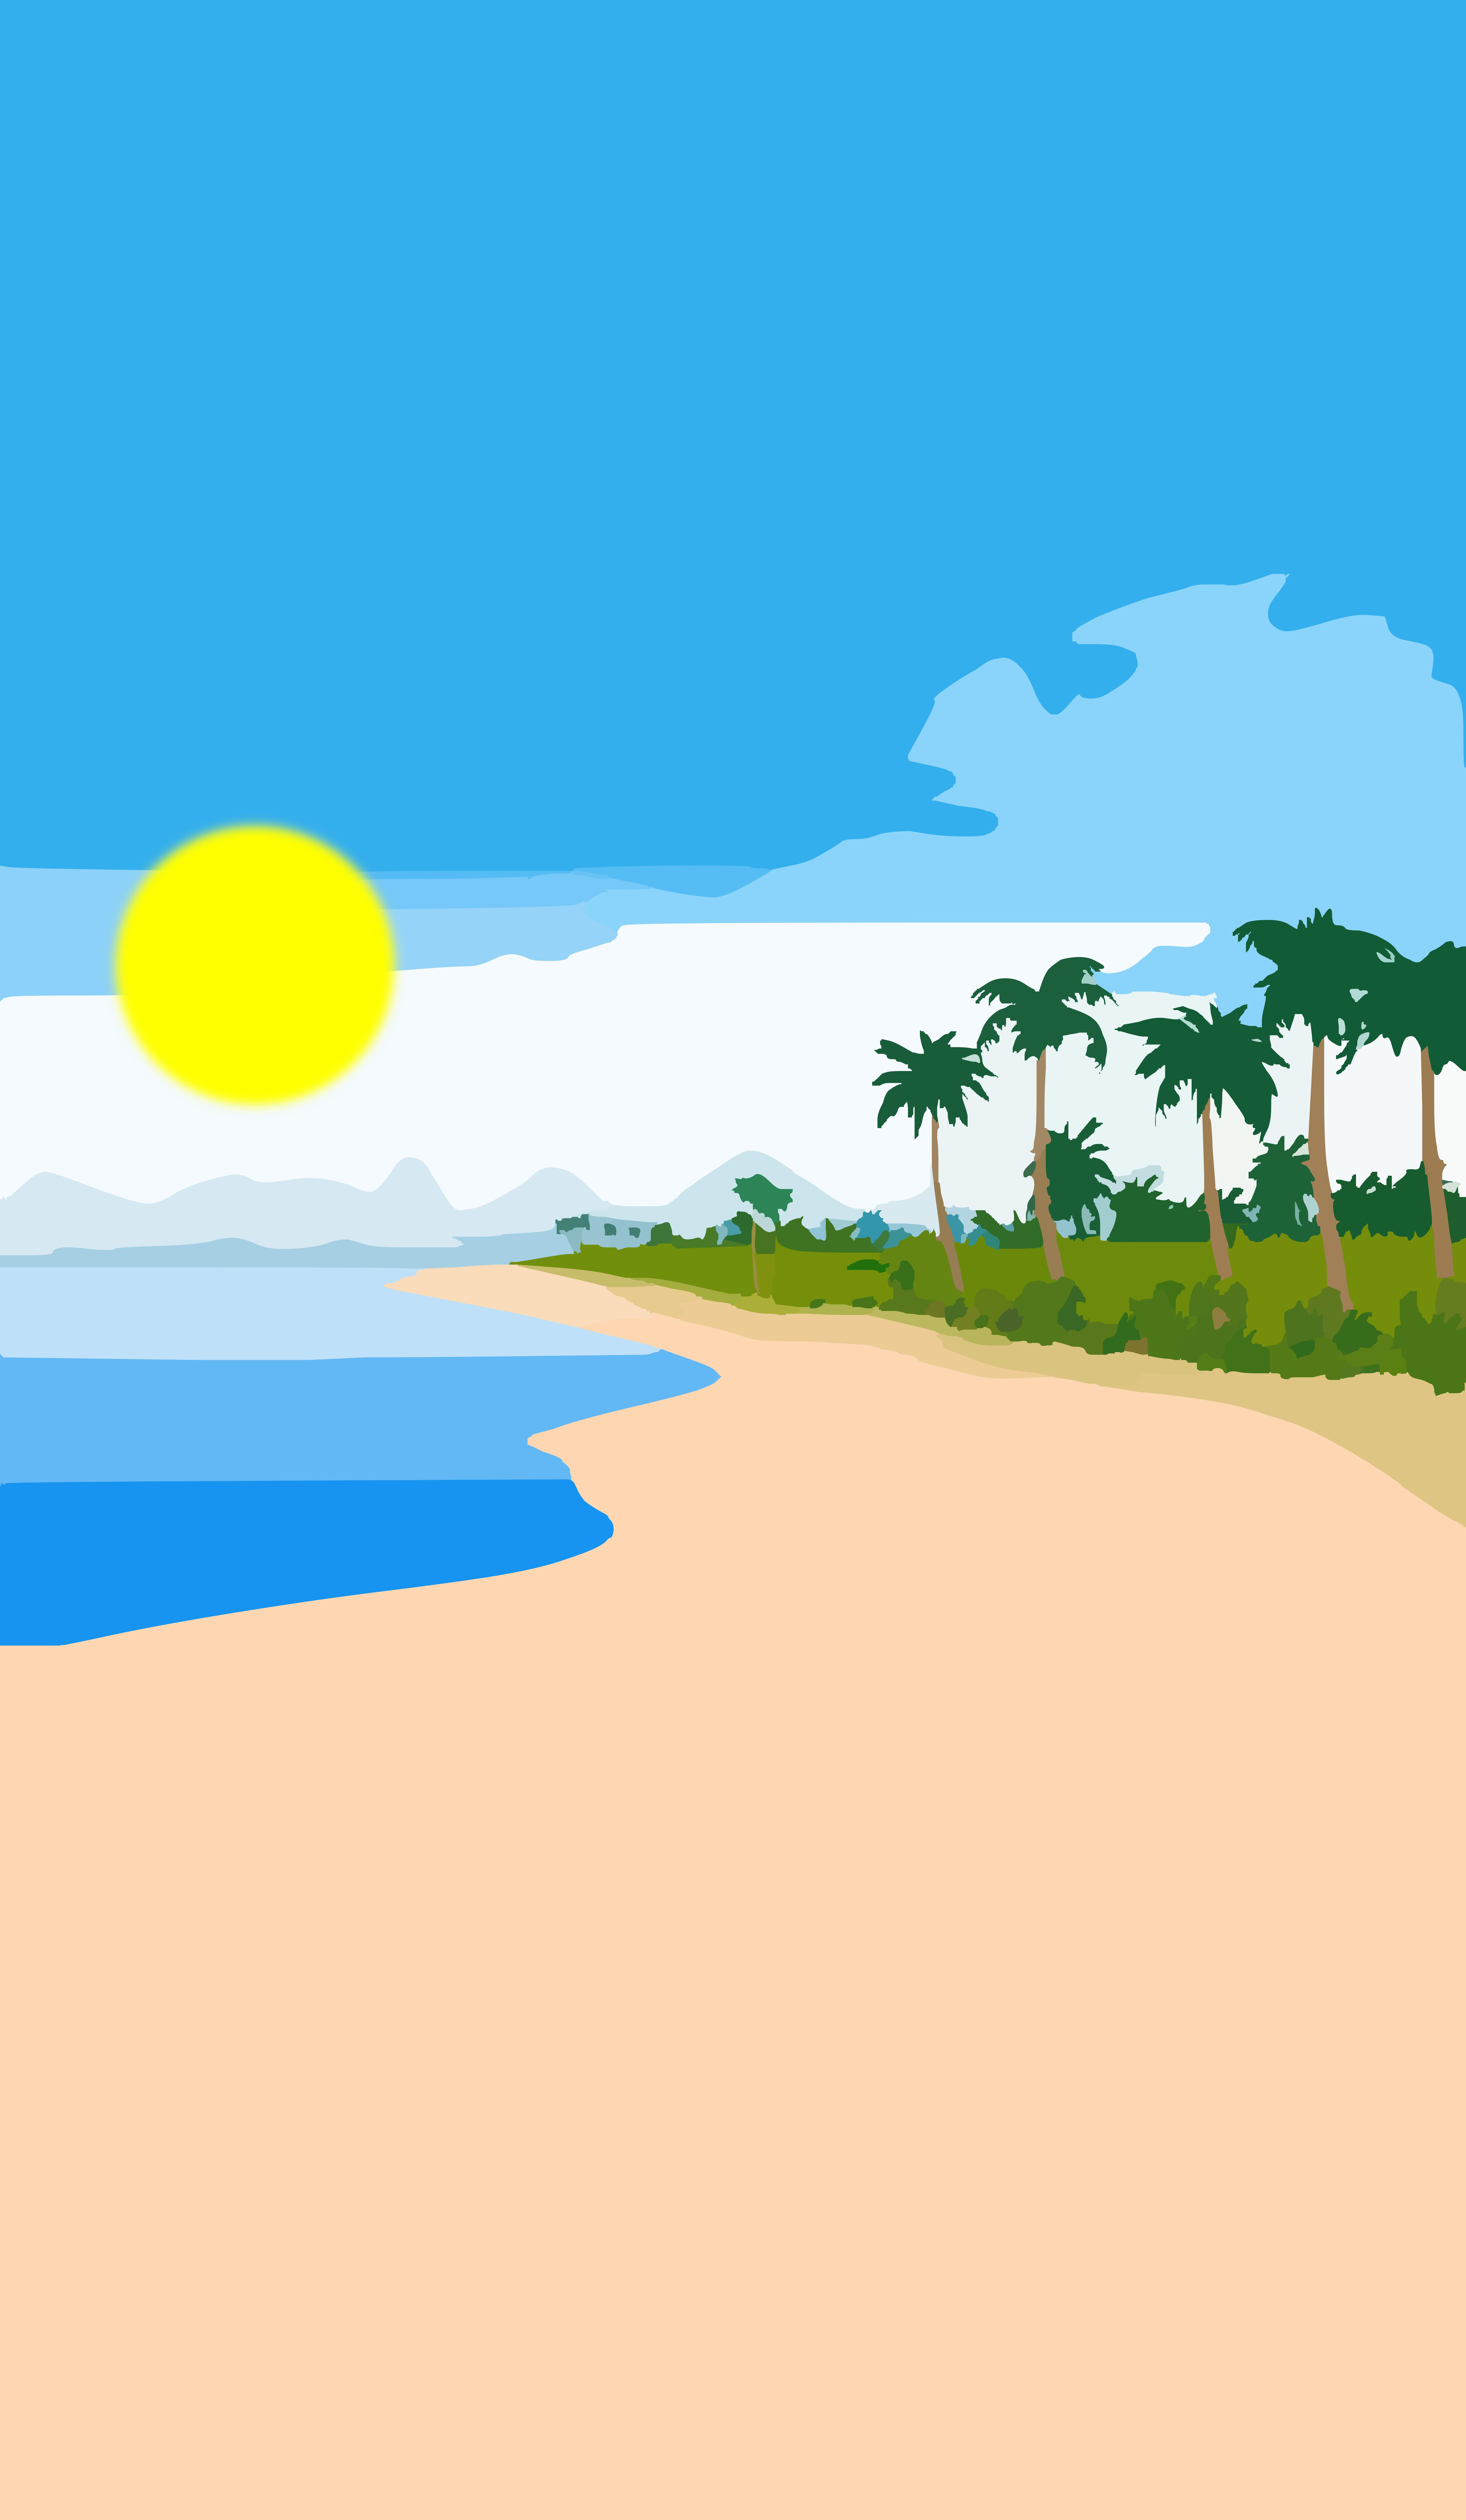 Beach Portrait | Free Images at Clker.com - vector clip ...